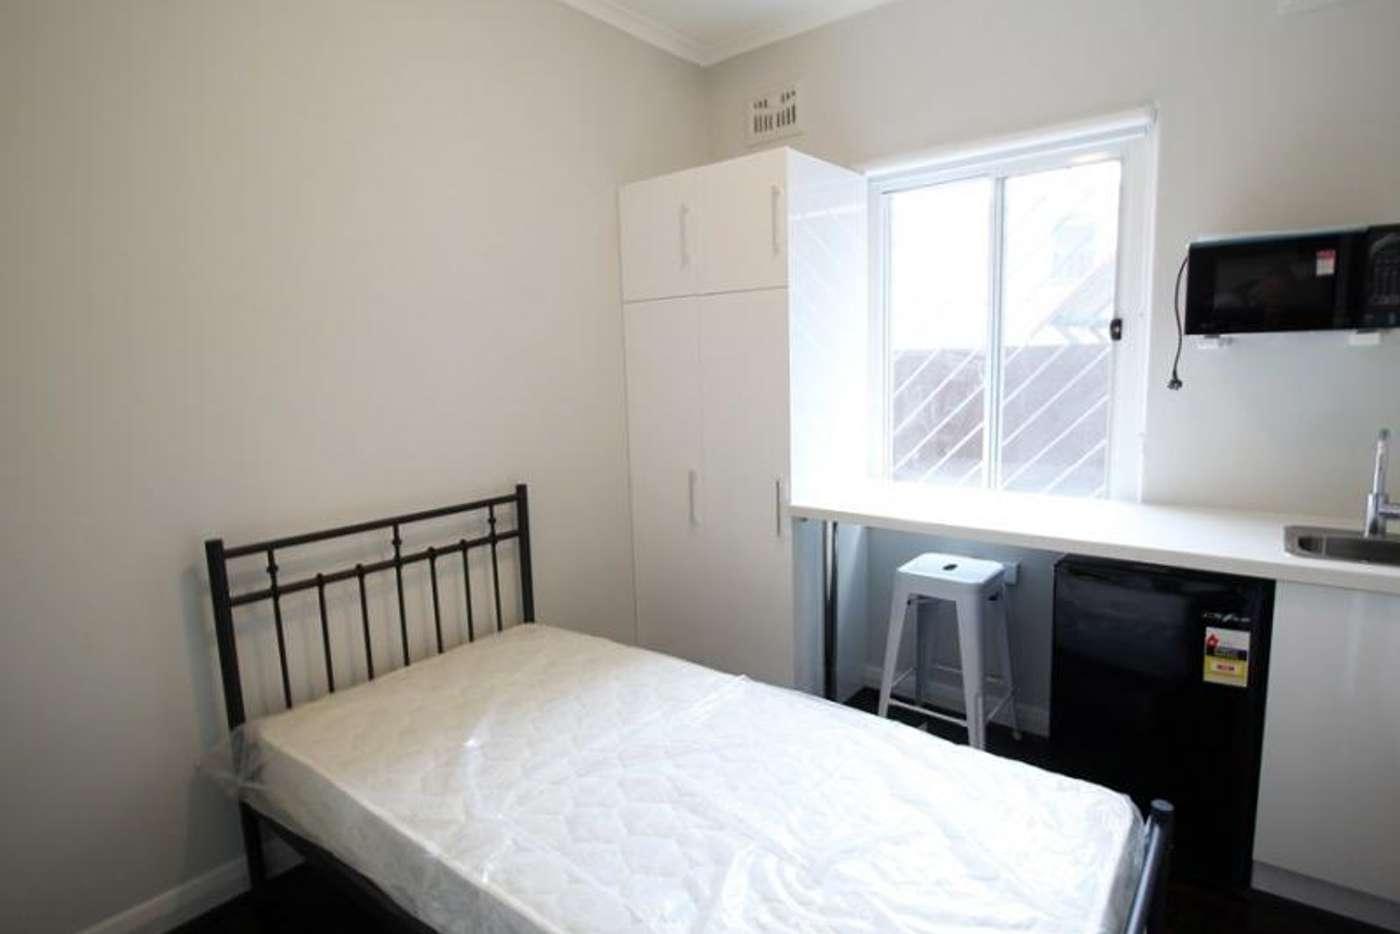 Main view of Homely studio listing, 345 Bourke Street, Darlinghurst NSW 2010